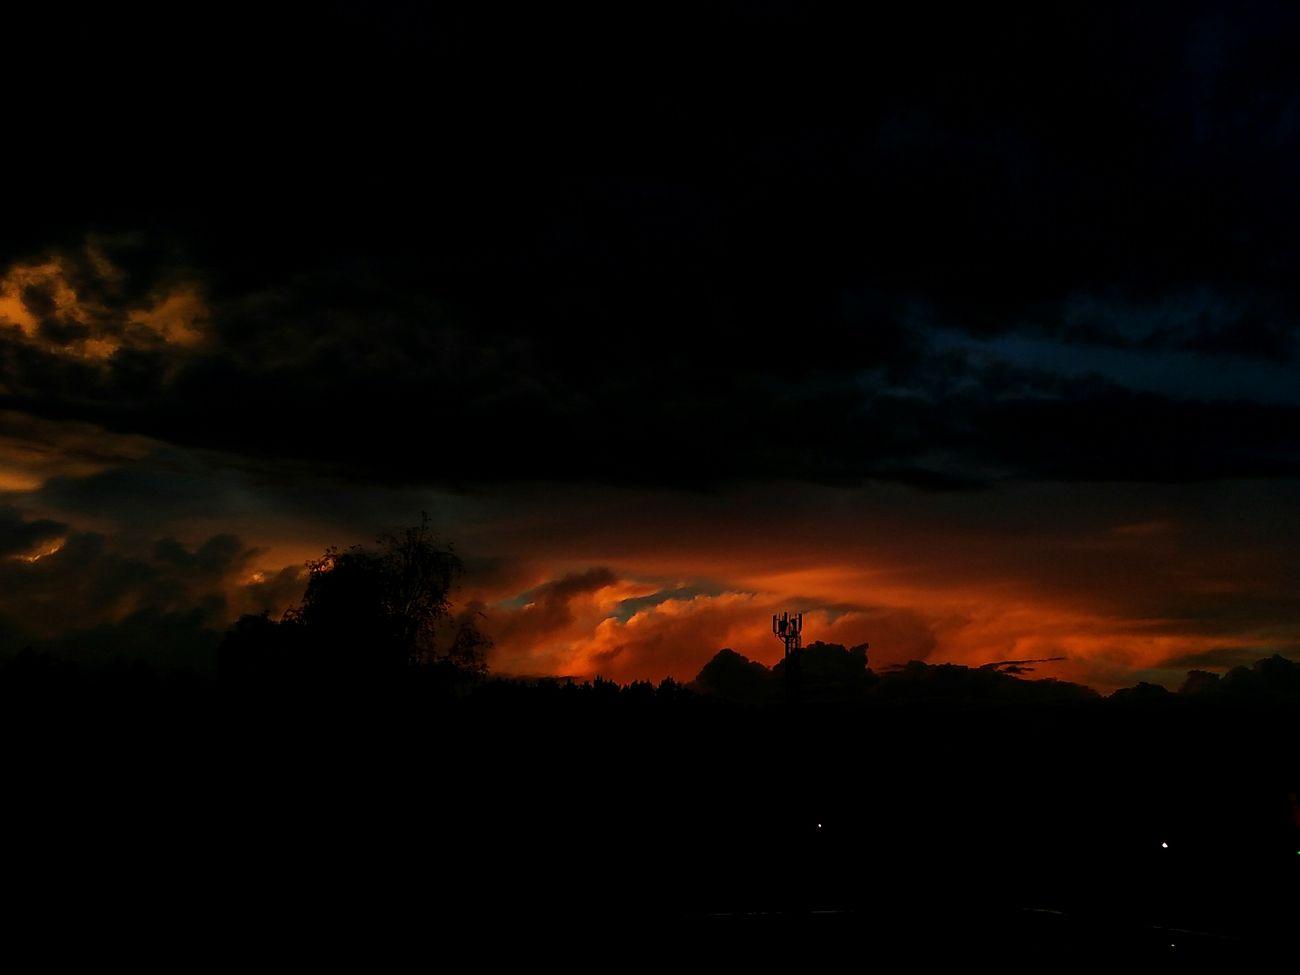 After Rain No People After Rain!💧💧 Photography I LOVE PHOTOGRAPHYHeaven Mobile Photography beauty in Nature HEAV Natural Beauty Nature Gold Colored Beautiful Sunset Cloud - Sky I Like It